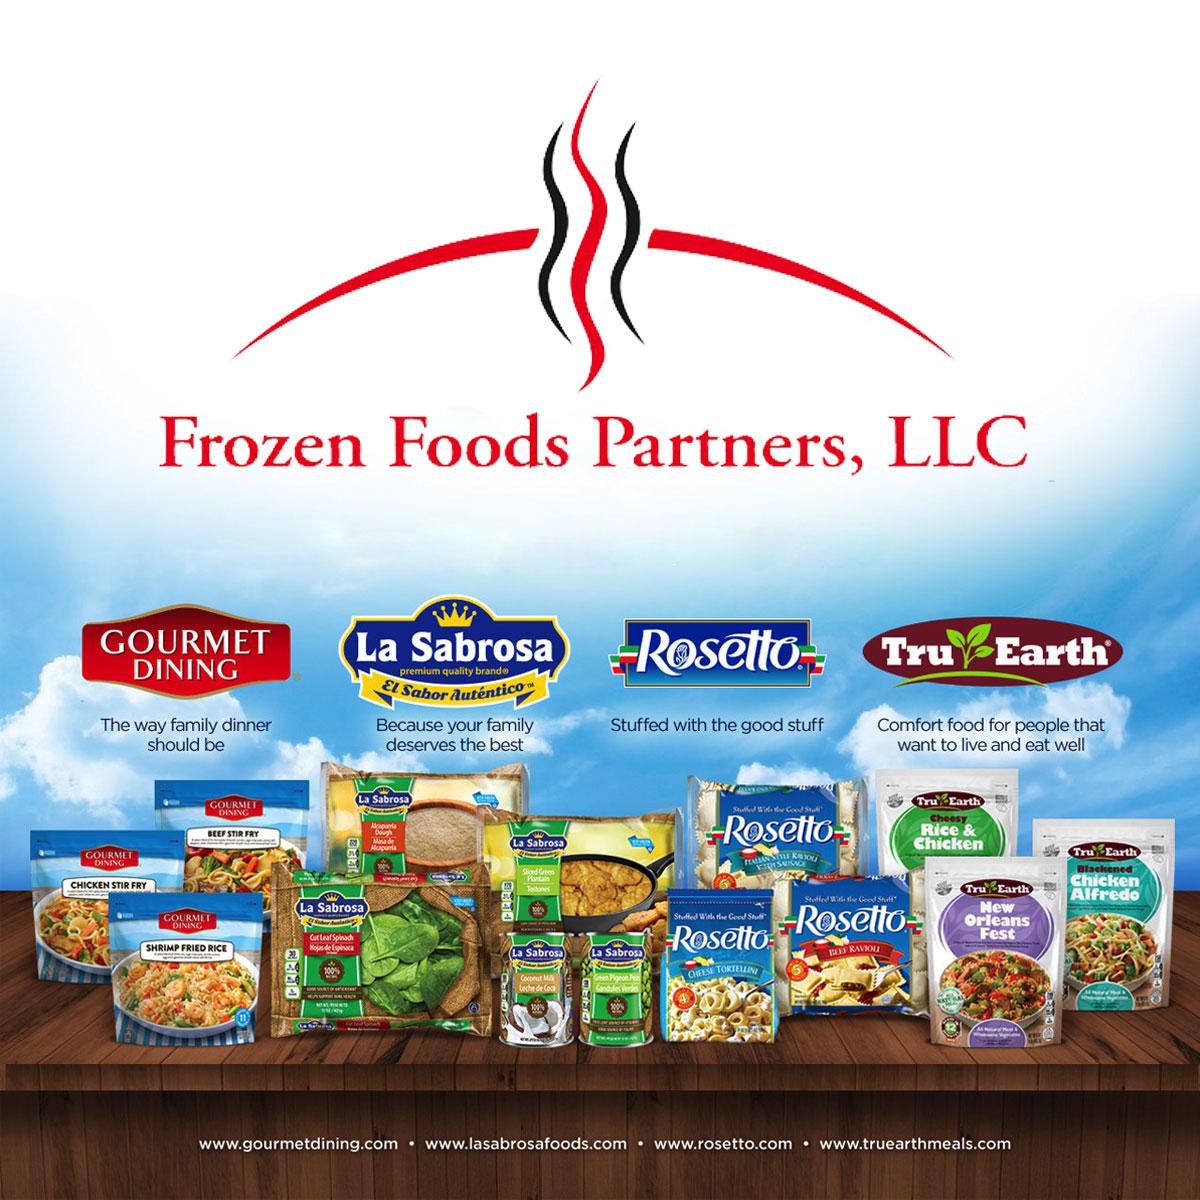 Frozen Foods Partners LLC, Co-Chaiman & Director Marty Sands